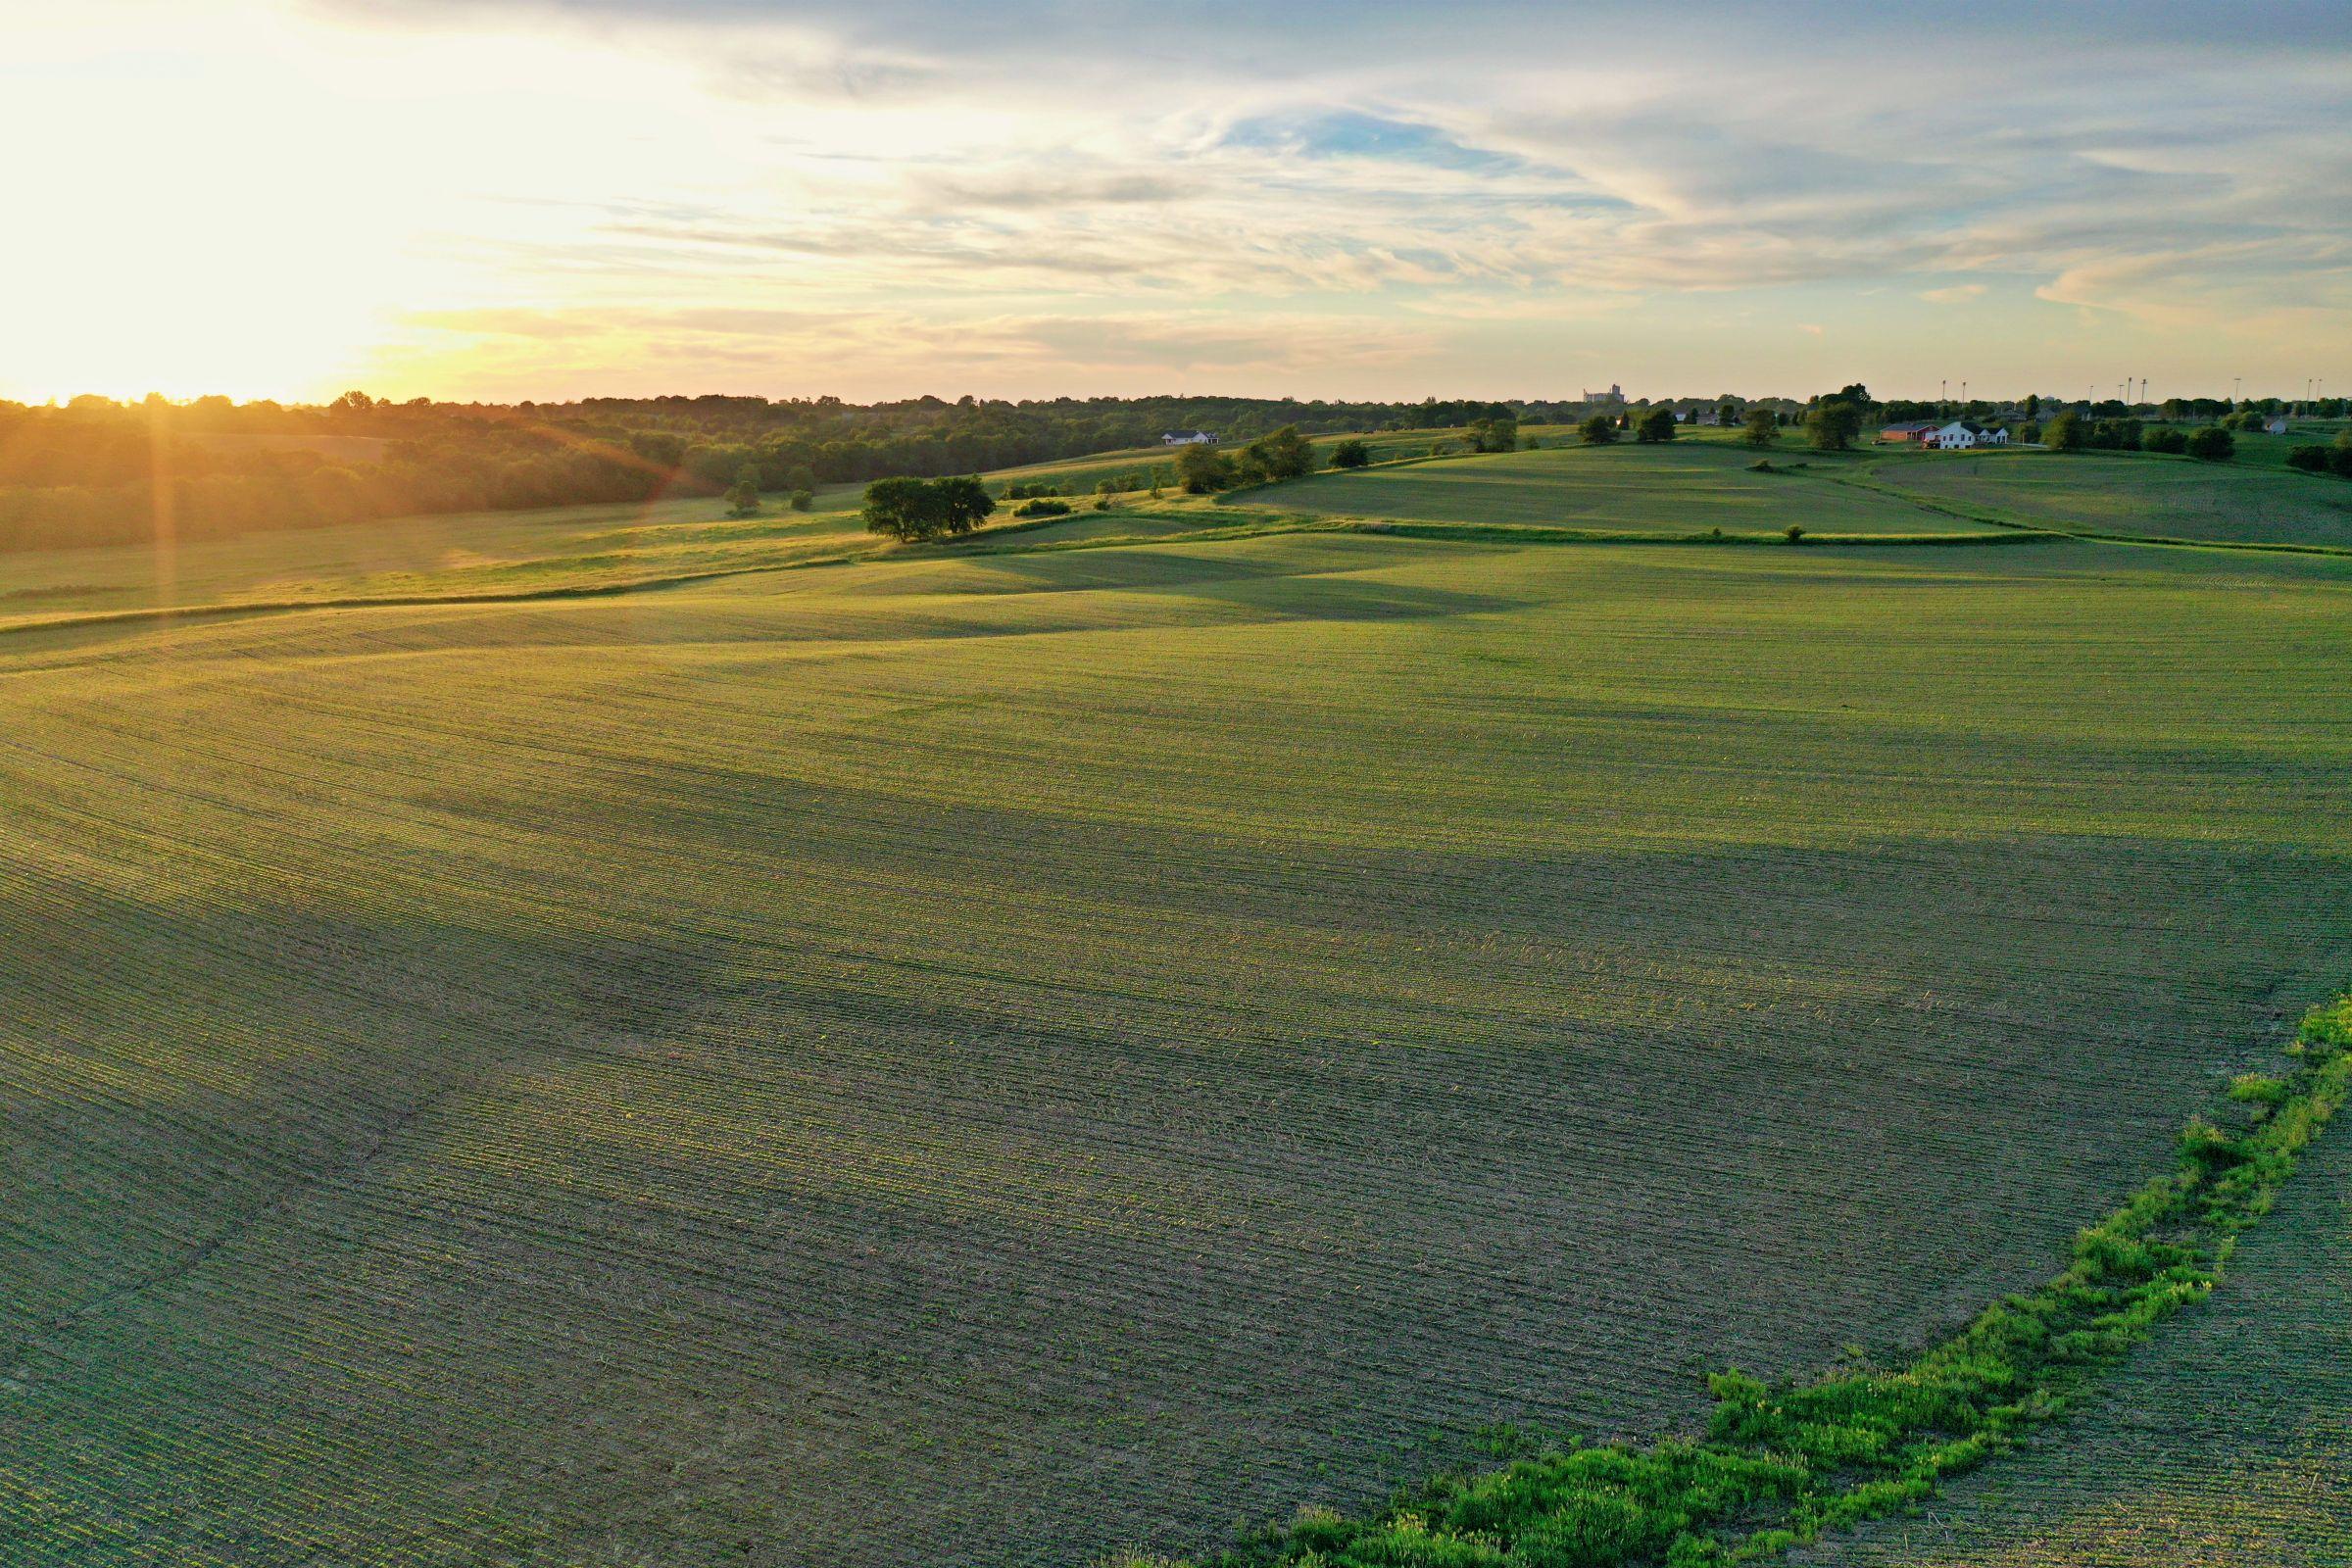 development-land-warren-county-iowa-20-acres-listing-number-15423-1-2021-03-25-203106.JPG